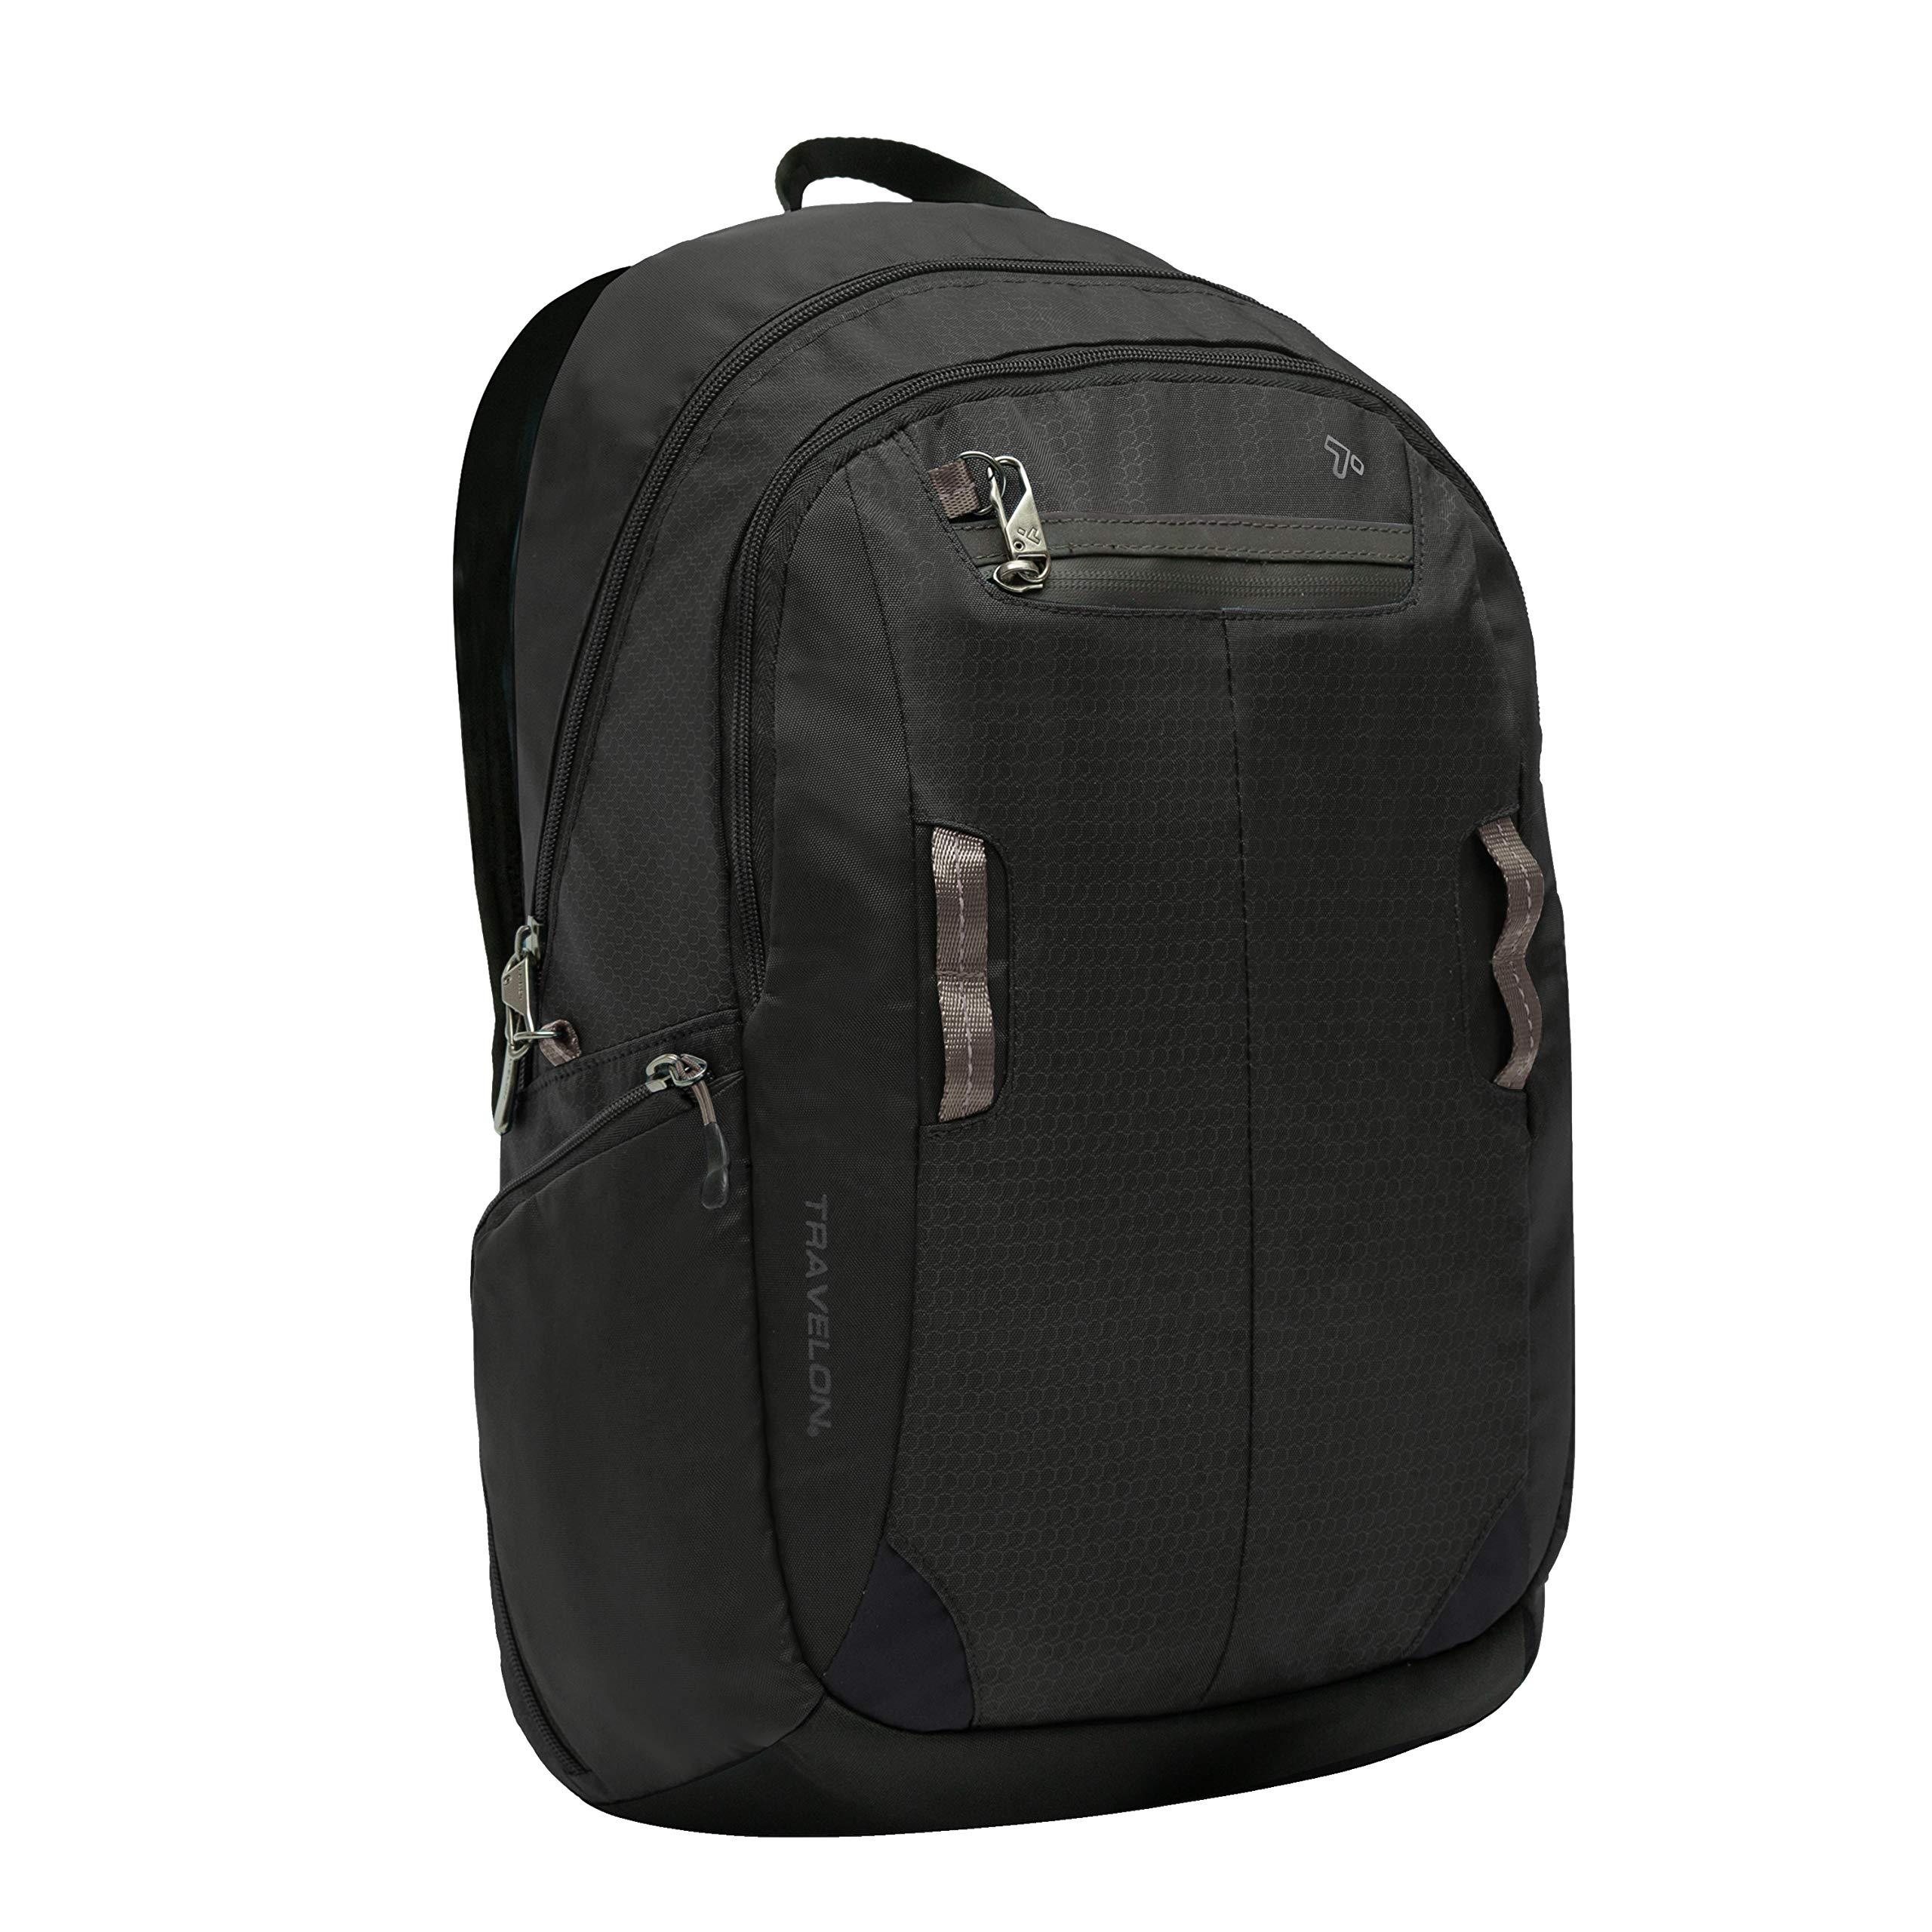 Travelon Anti-Theft Active Daypack, Black